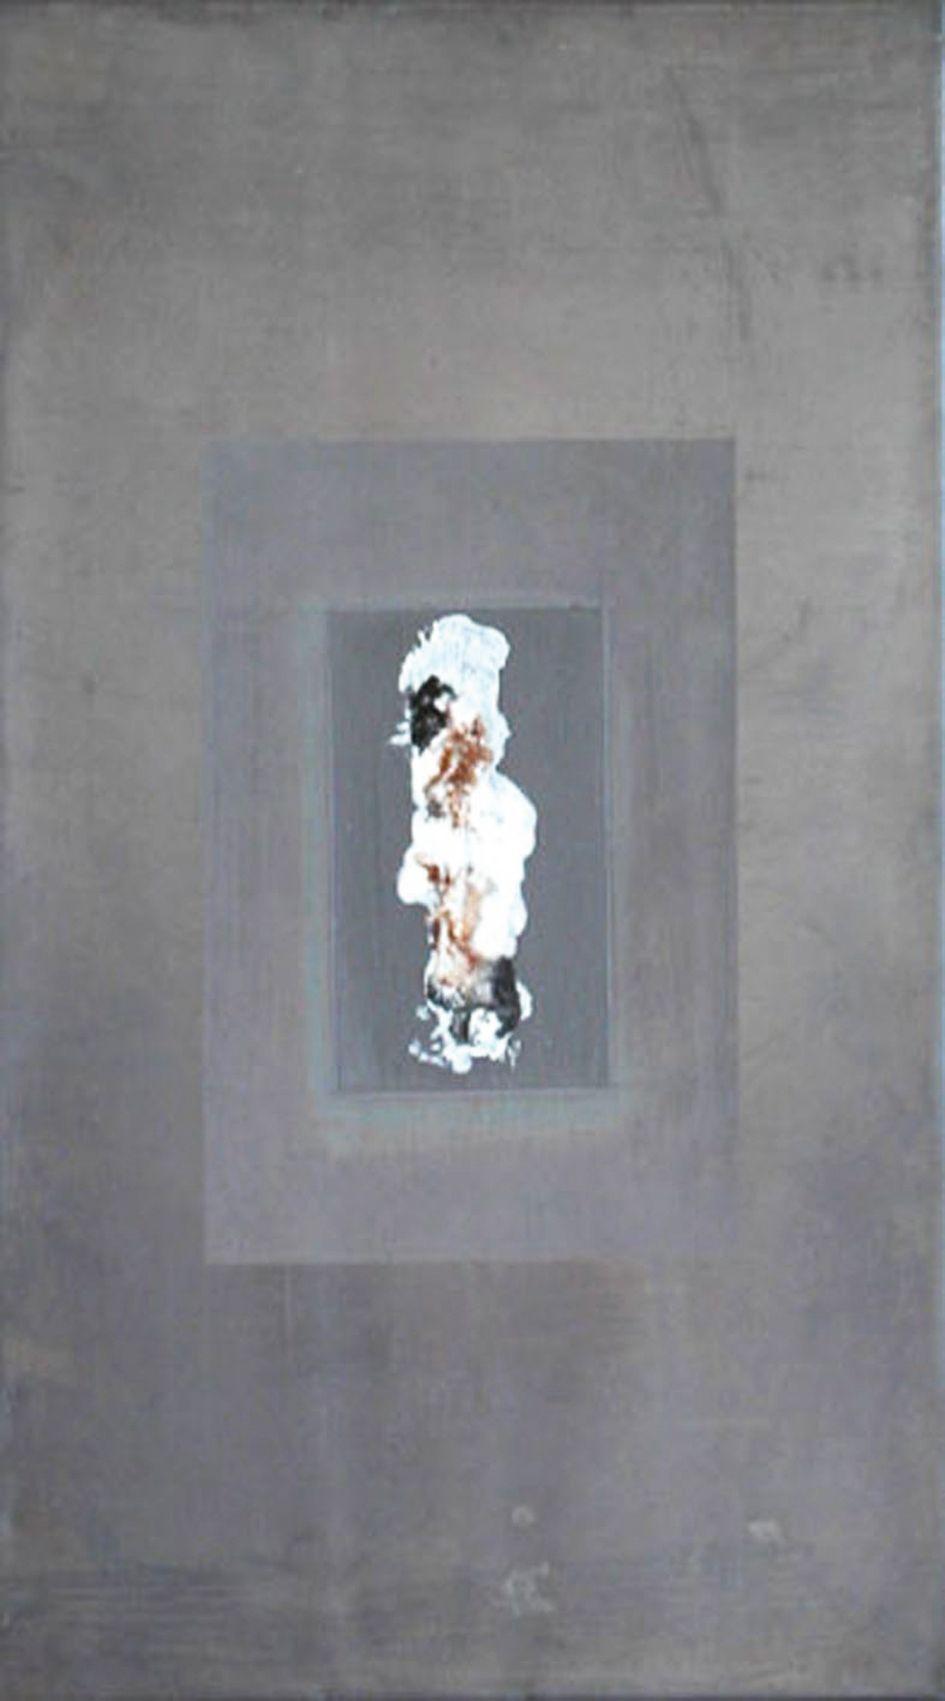 Bleigruppe Teil 3 - Bleibild von Ute Latzke, Mixed Media: Blei, Acryl, MDF-Platte. #blei #lead #art #mixedmedia #graphic